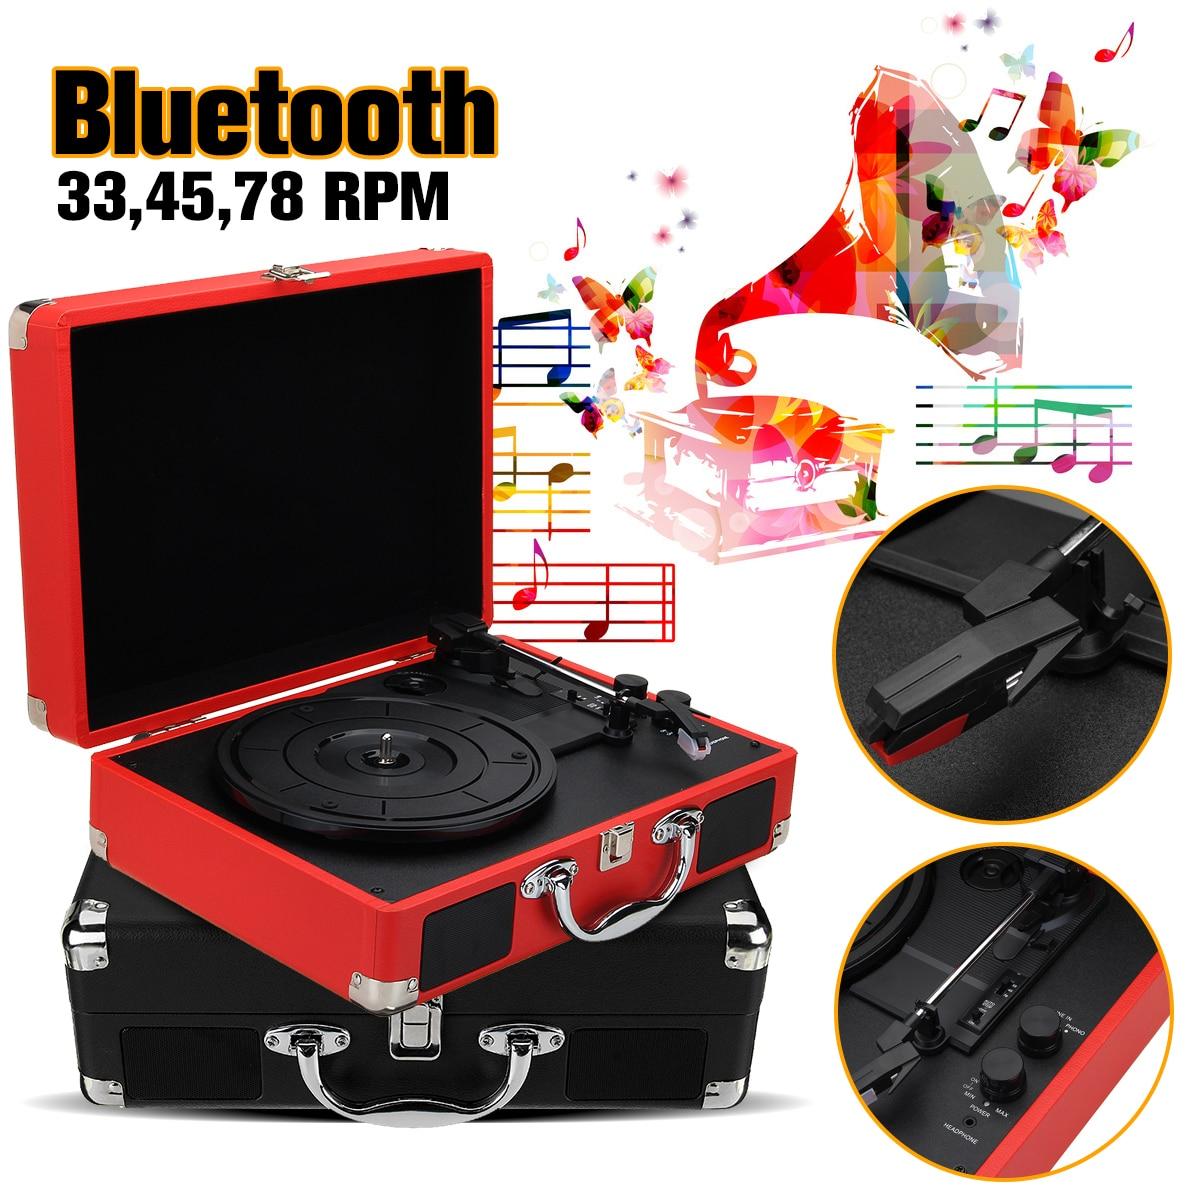 Kunststoff Holz Retro 33/45/78 rpm Bluetooth PH/INT/BT 2,0 Koffer Plattenspieler Vinyl LP rekord Telefon Player 3-Speed 3,5mm AUX IN